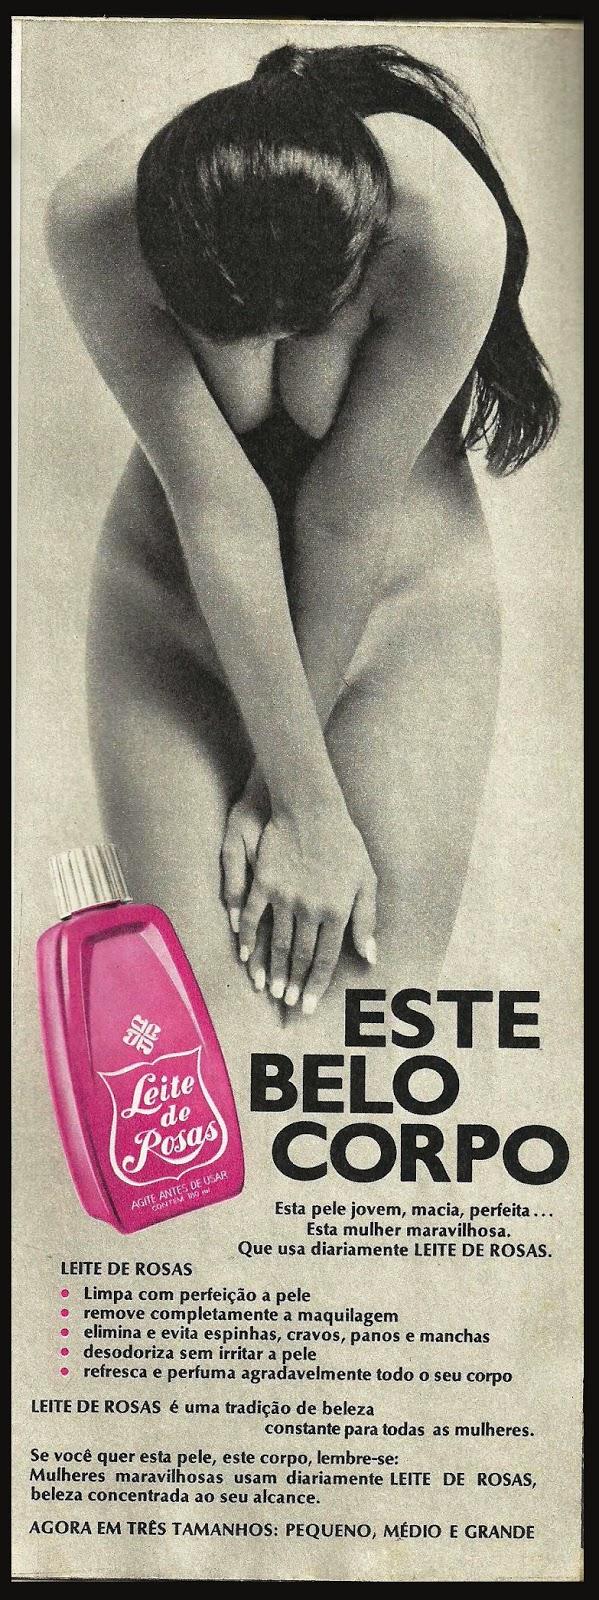 1972; moda anos 70; propaganda anos 70; história da década de 70; reclames anos 70; brazil in the 70s; Oswaldo Hernandez